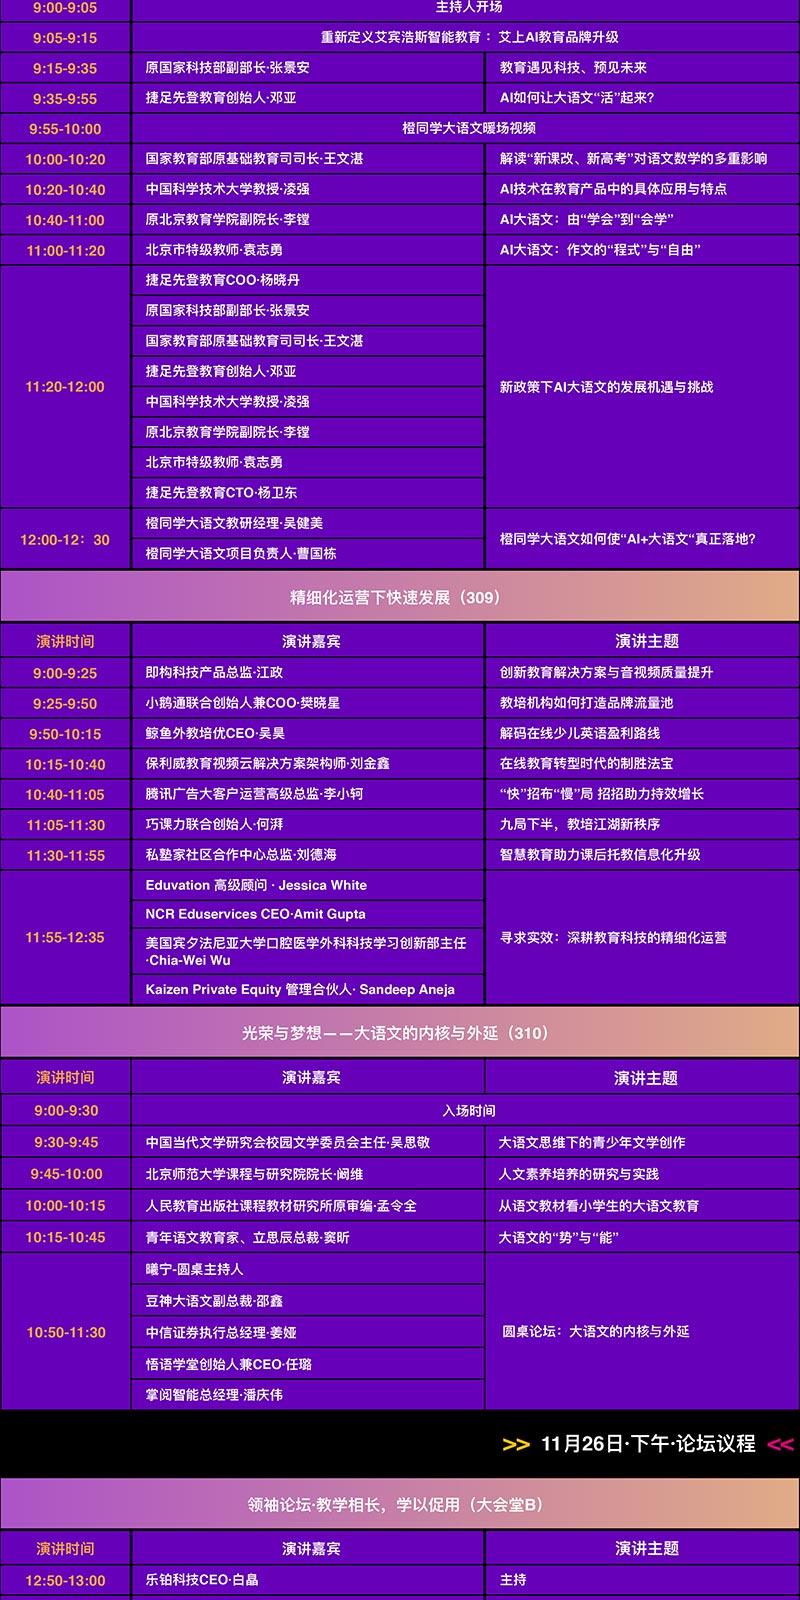 GET2019教育科技大会 教育消费博览会 议程